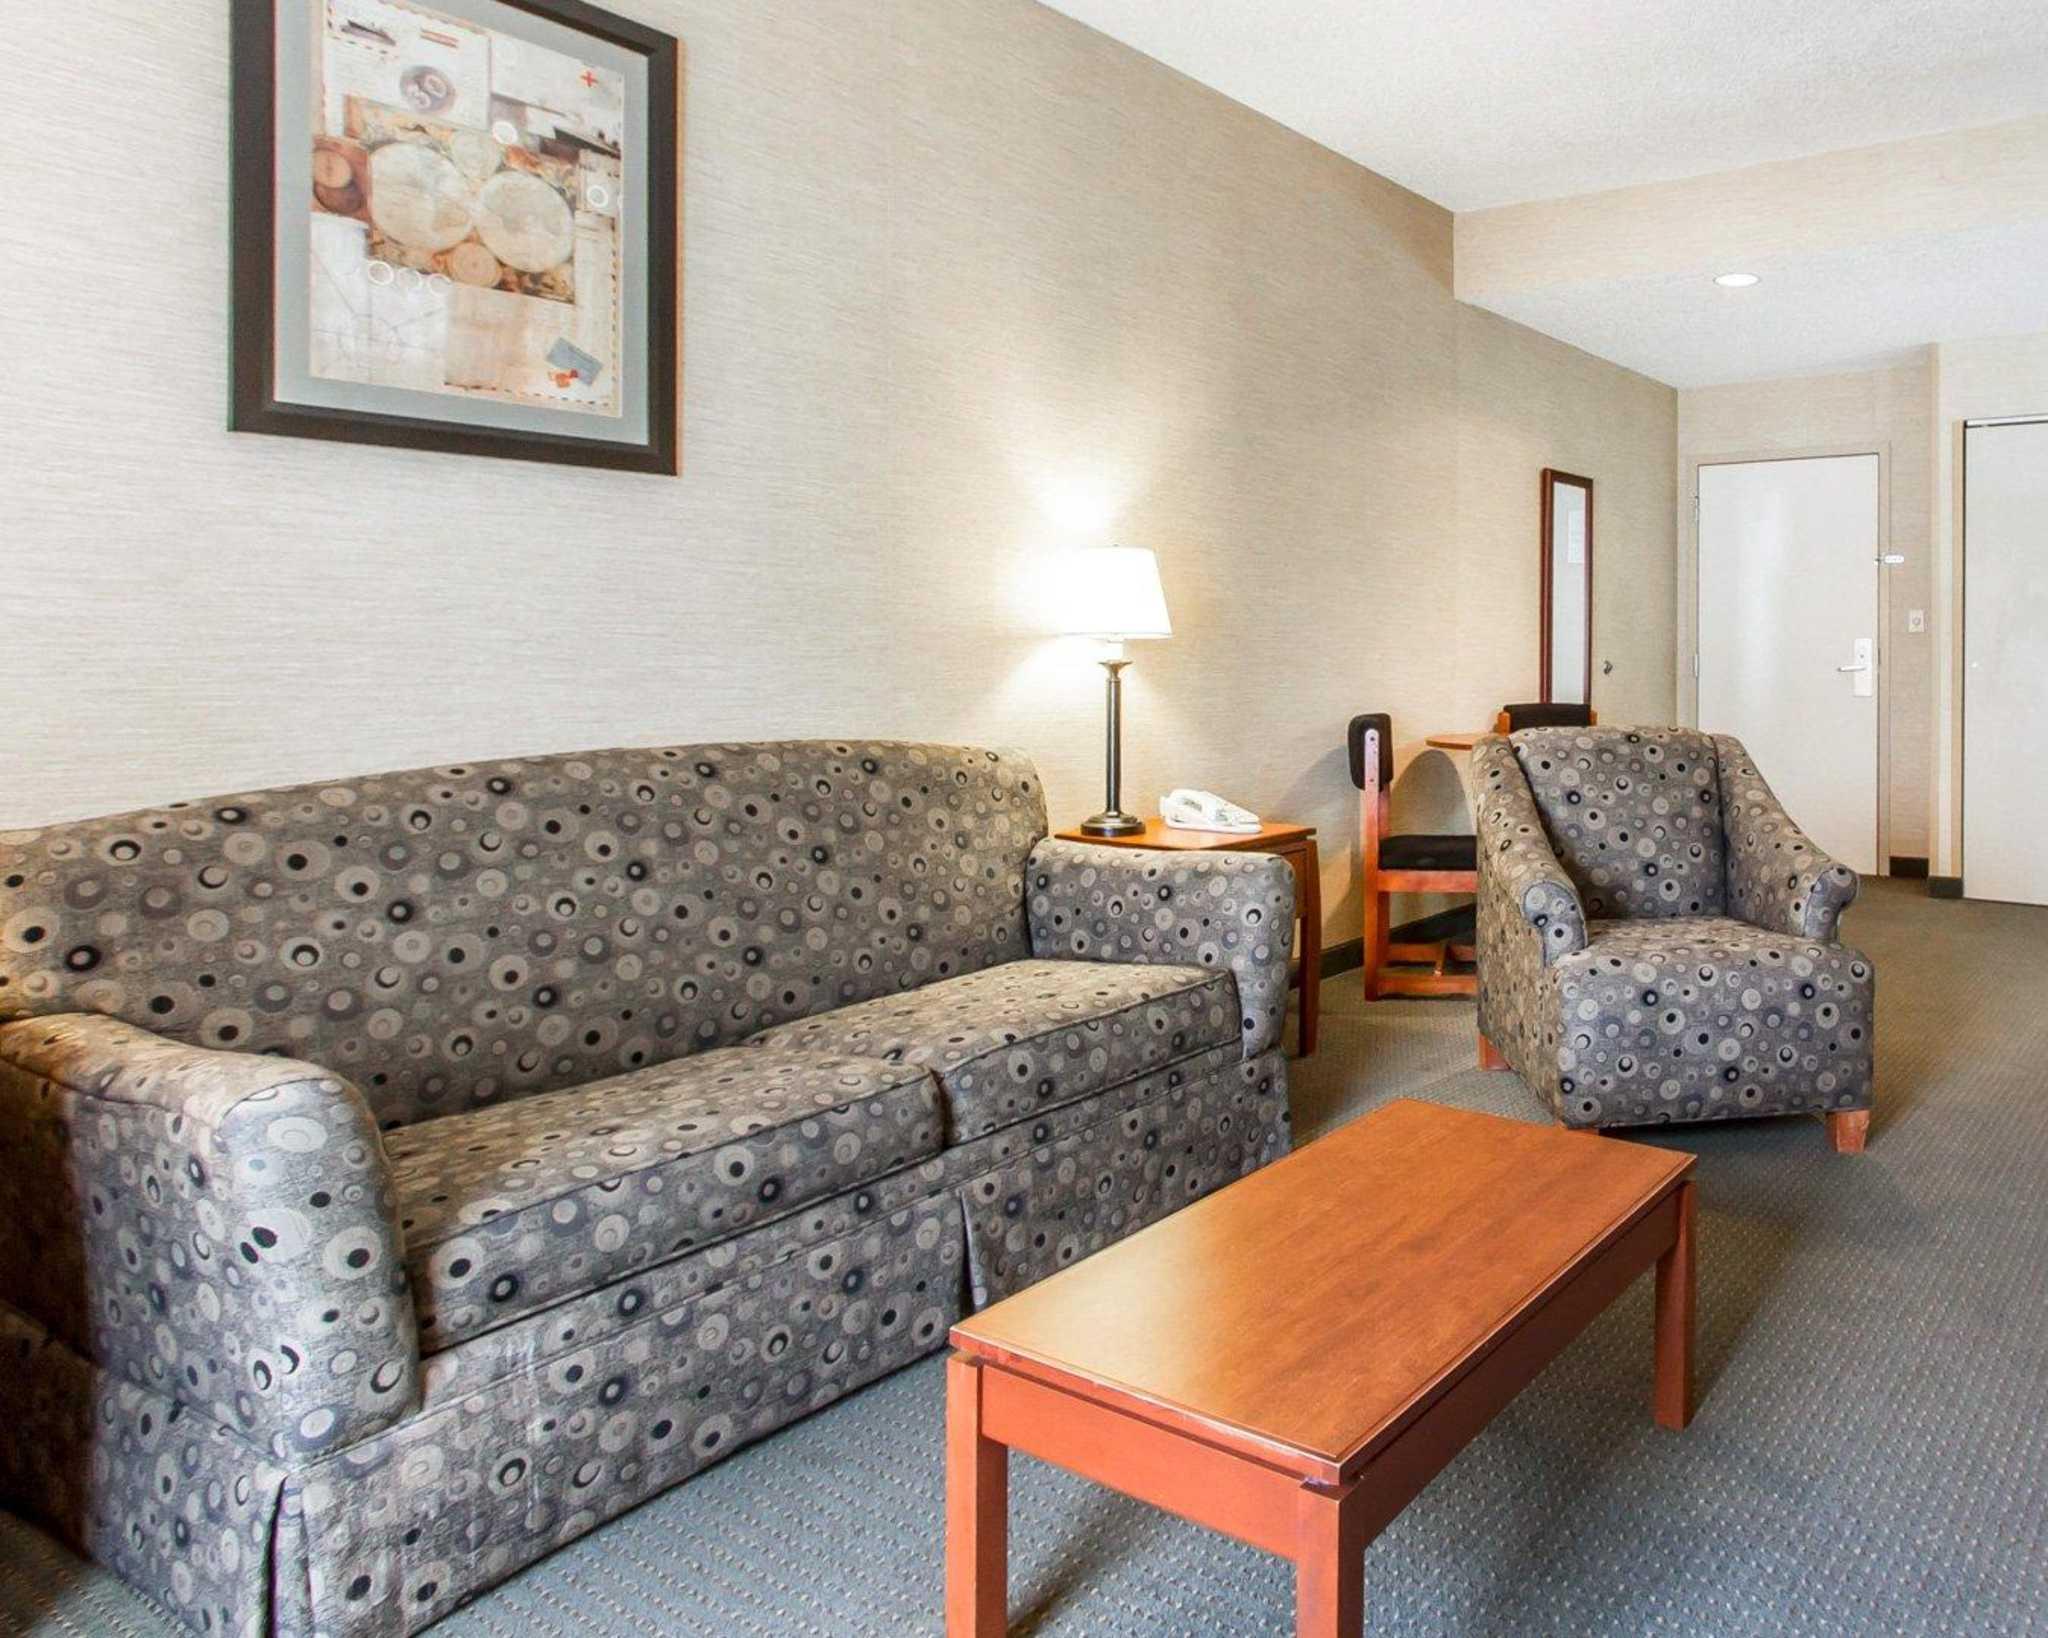 Quality Inn Suites Benton Draffenville 173 Carroll Rd Benton